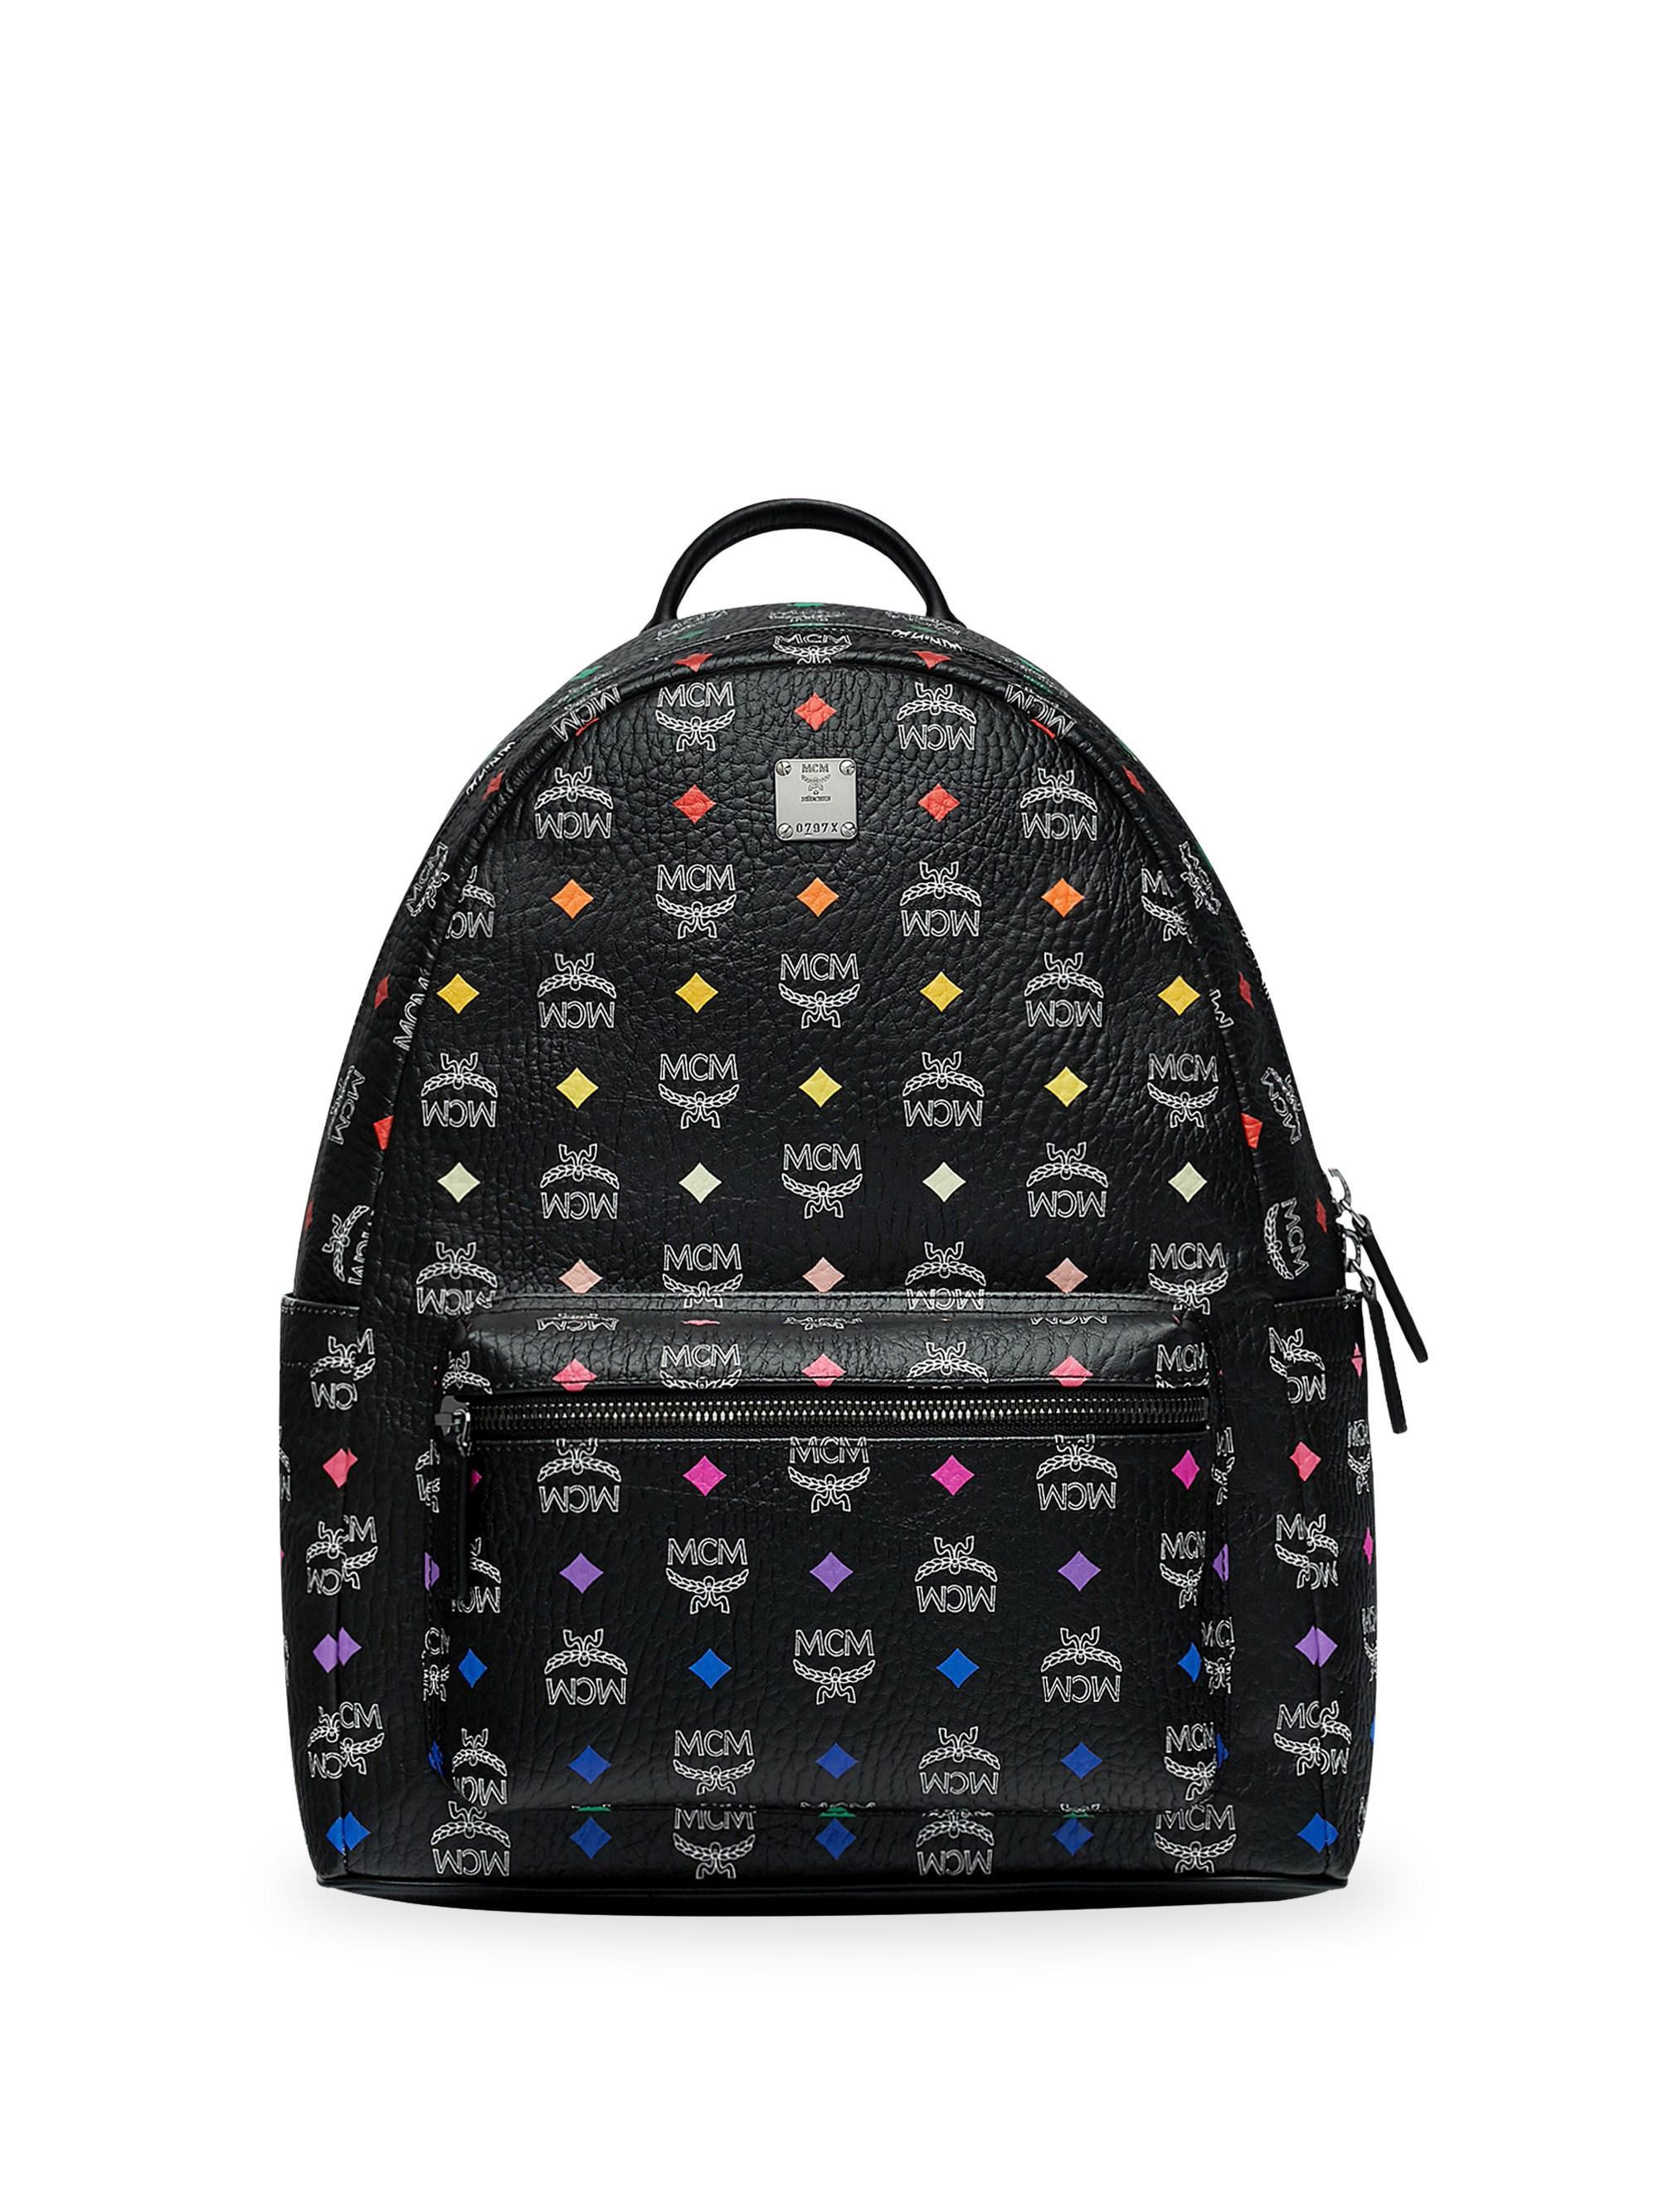 a7d16a8ad58 MCM - Black Stark Backpack In Skyoptic Stud Visetos for Men - Lyst. View  fullscreen